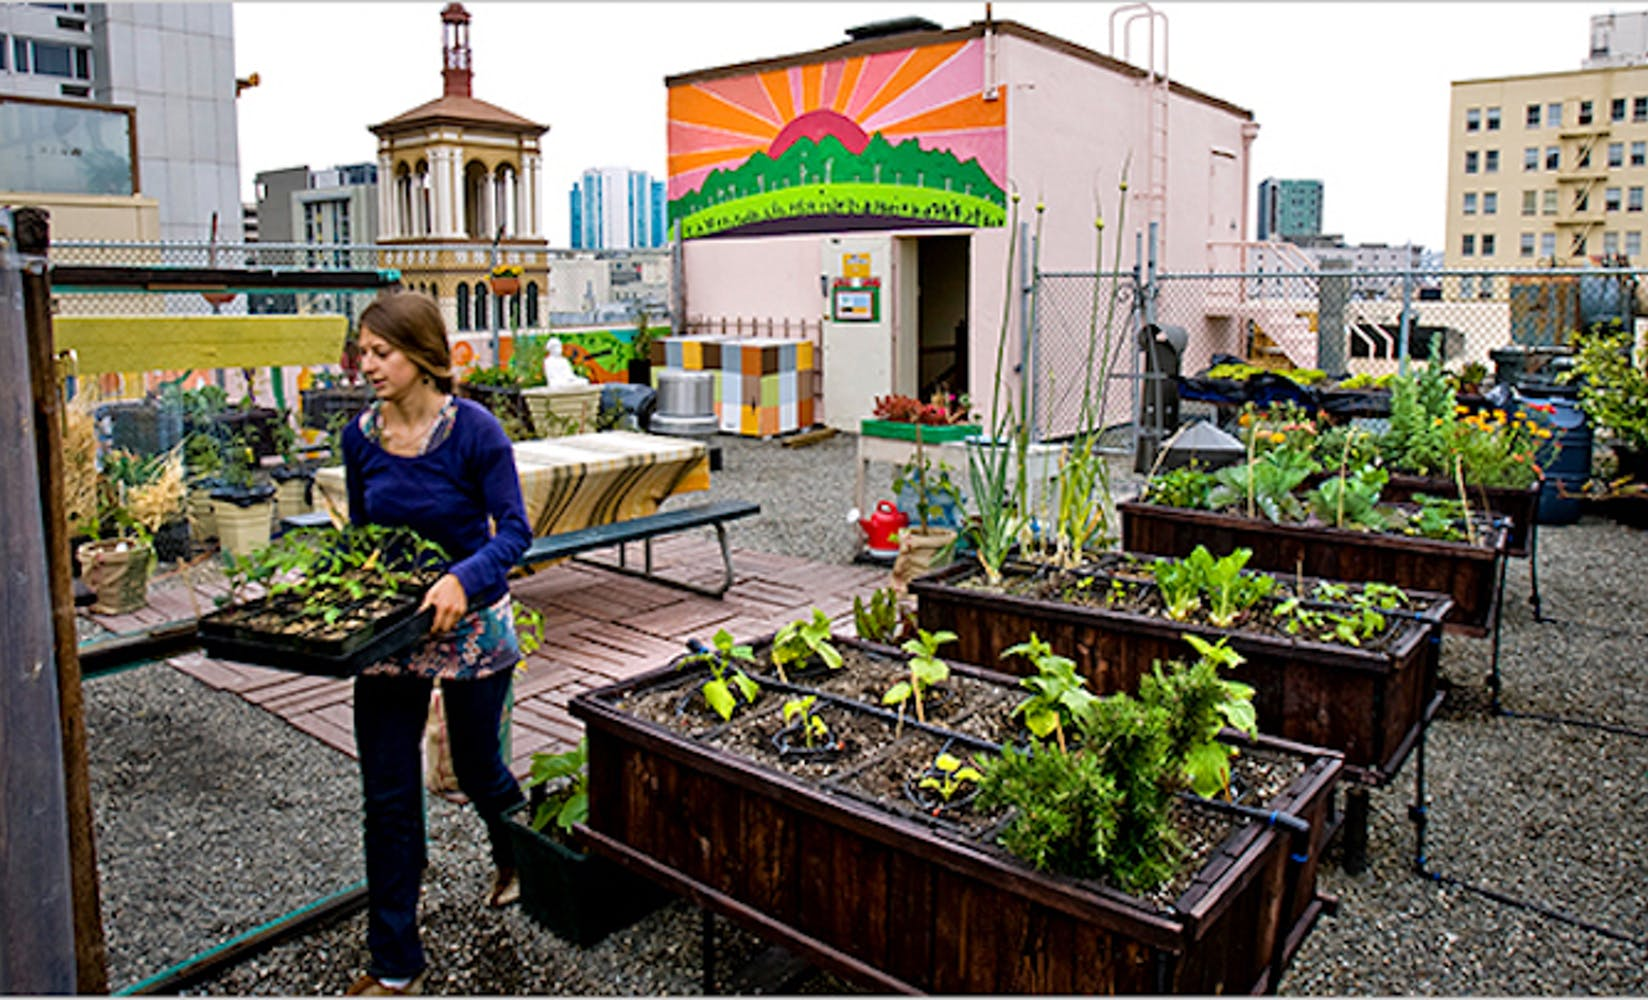 New york times urban farming